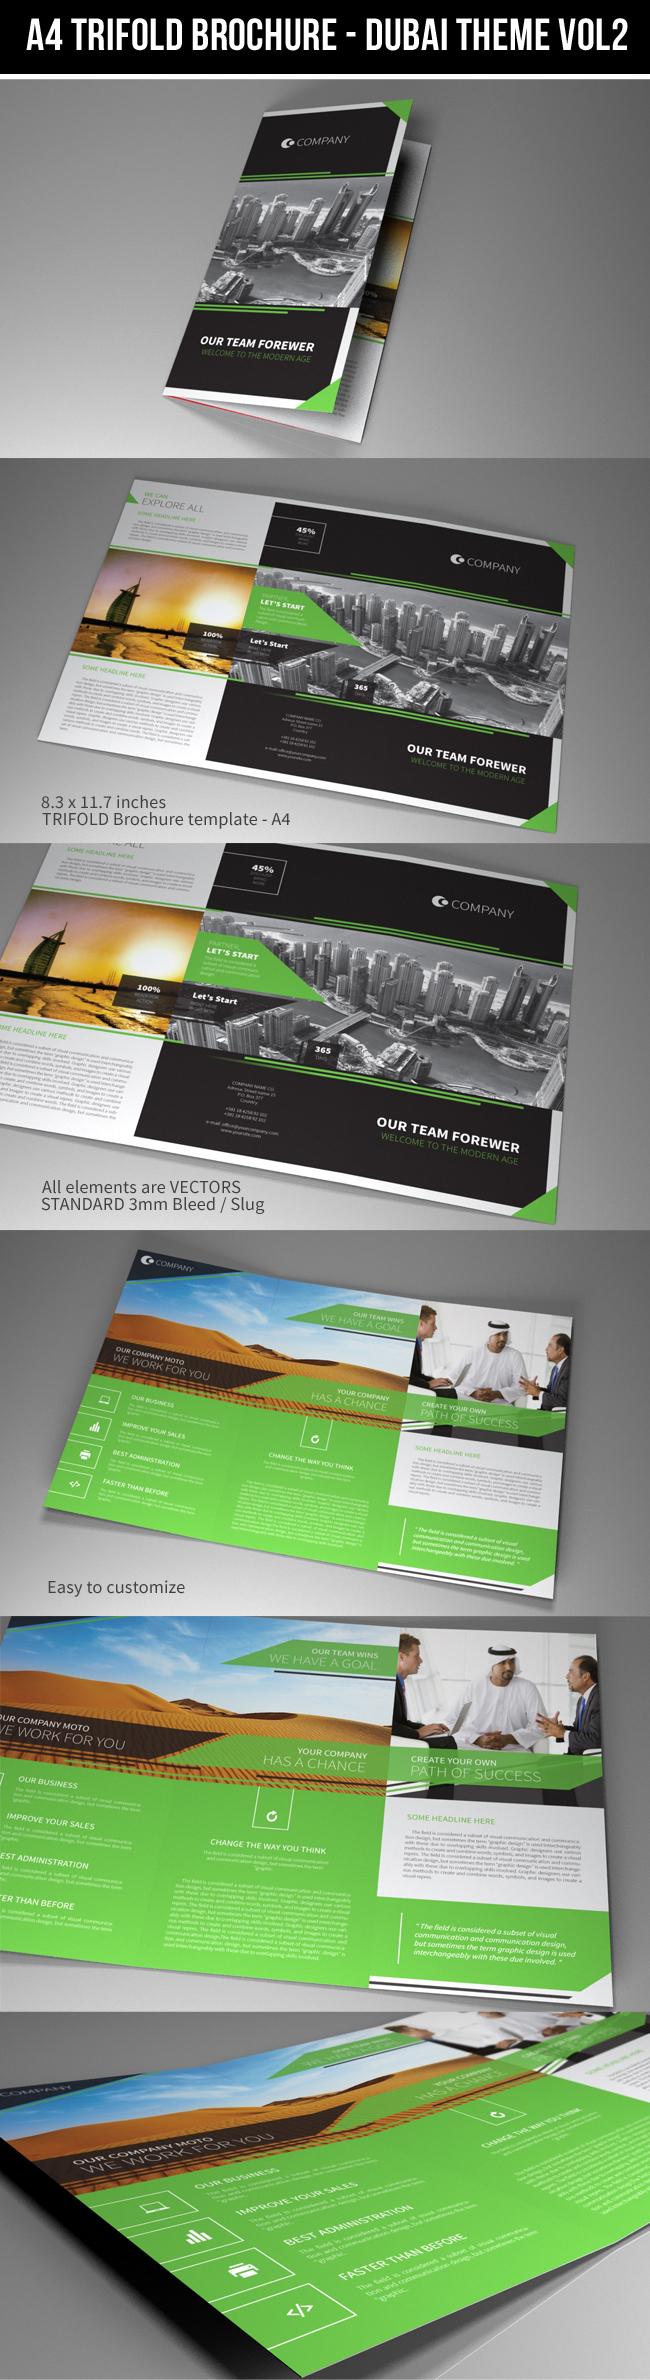 indesign template a4 trifold brochure dubai vol2 on behance. Black Bedroom Furniture Sets. Home Design Ideas